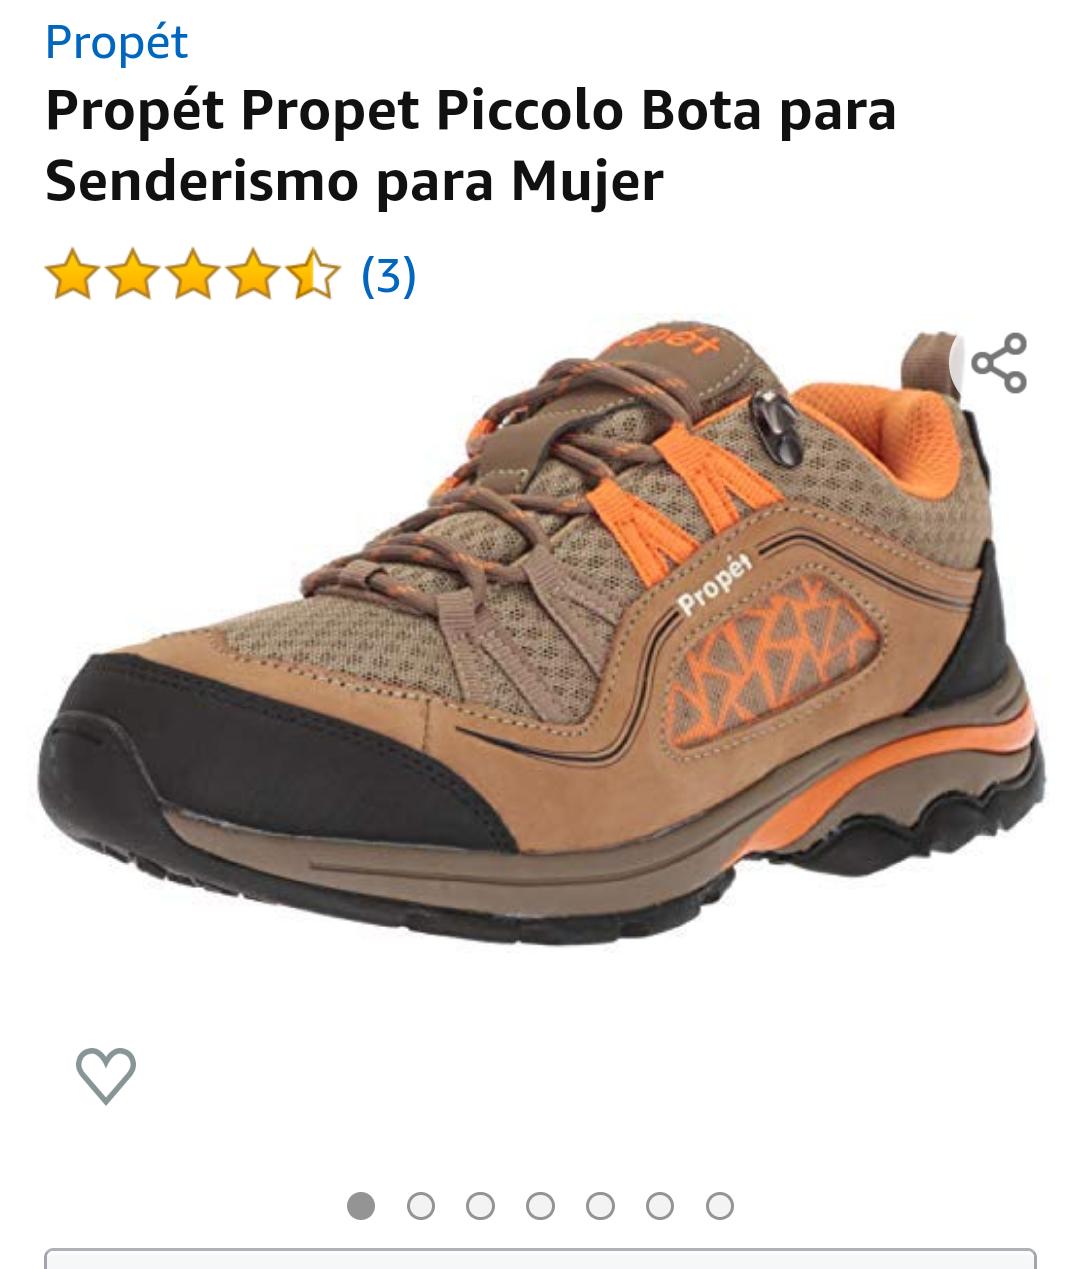 Amazon Propet Piccolo Bota mujer  para Senderismo